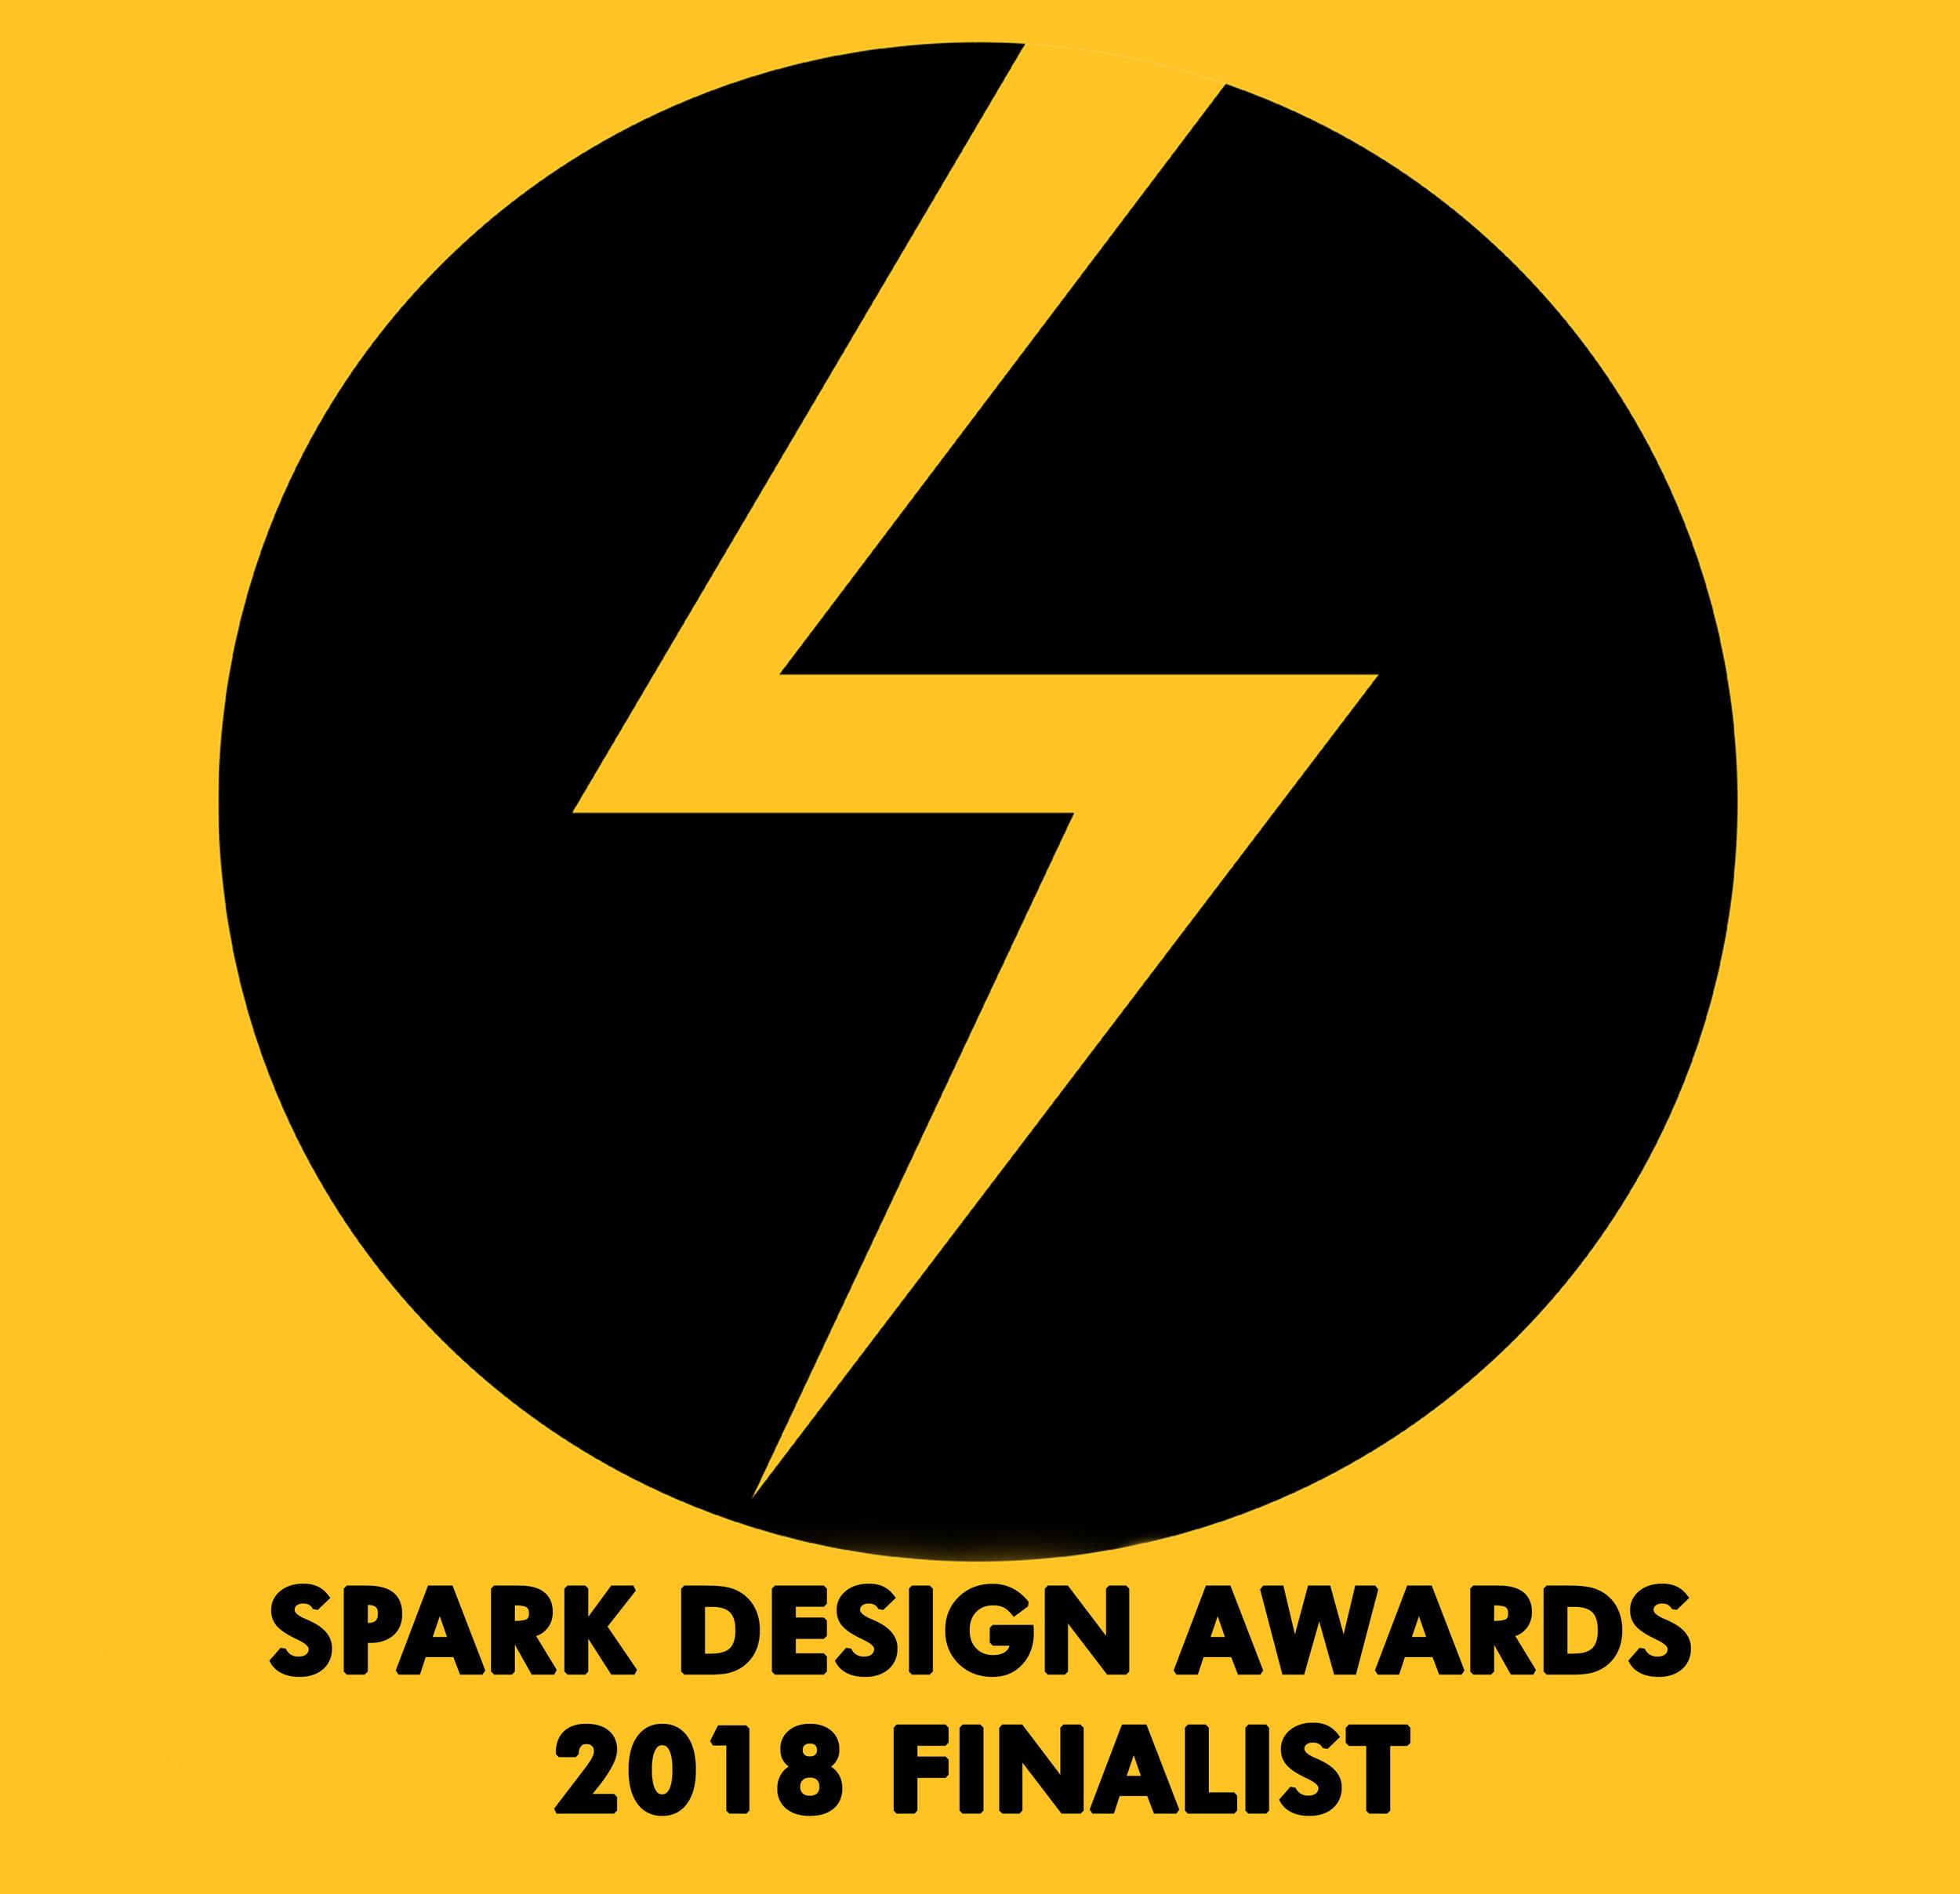 Spark Design Award - 2018